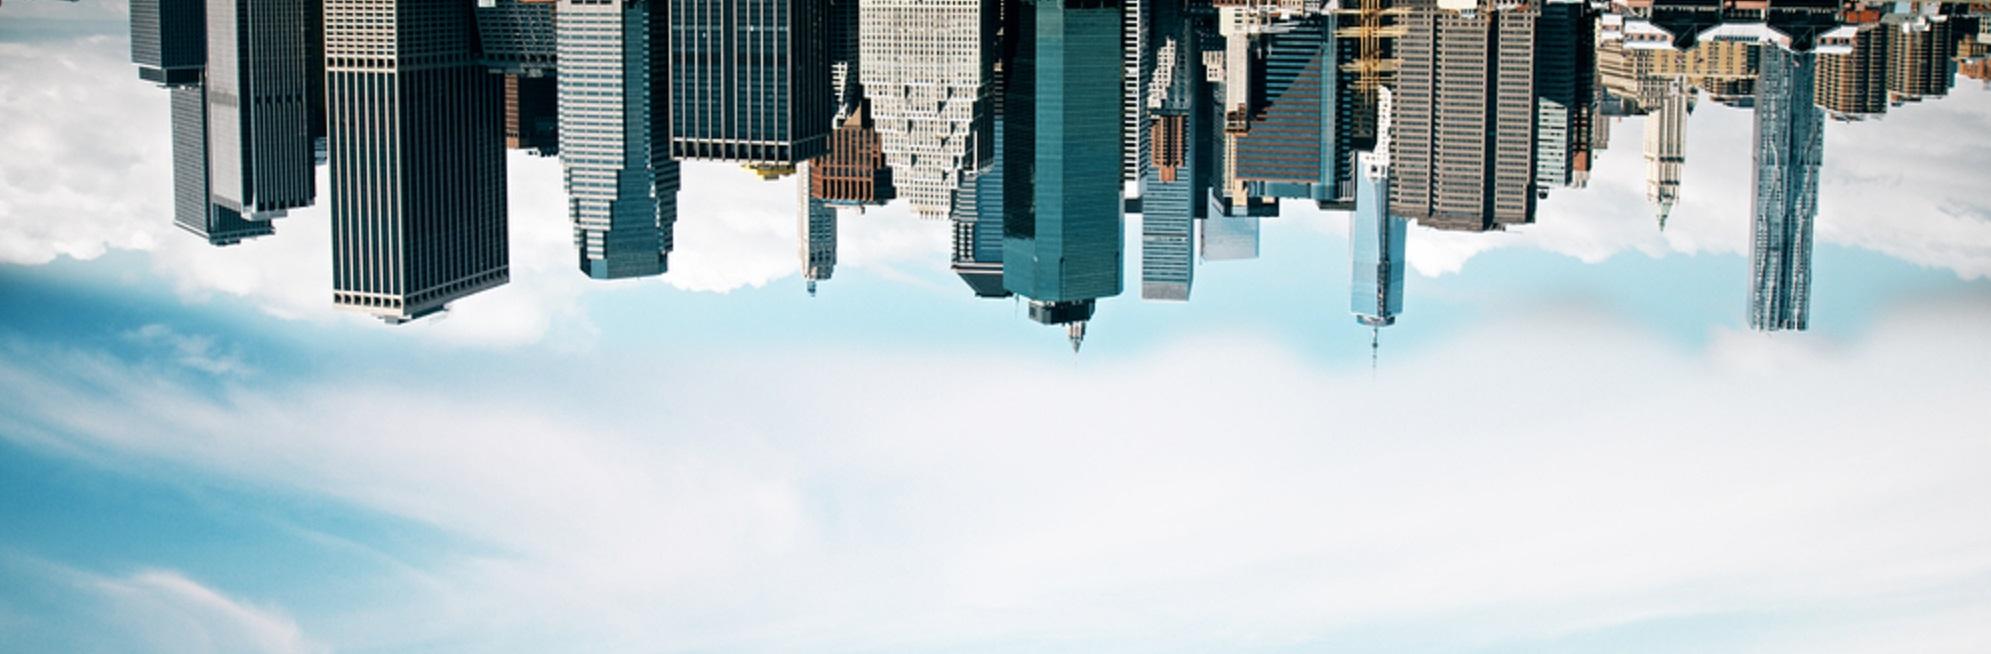 a city skyline upside down